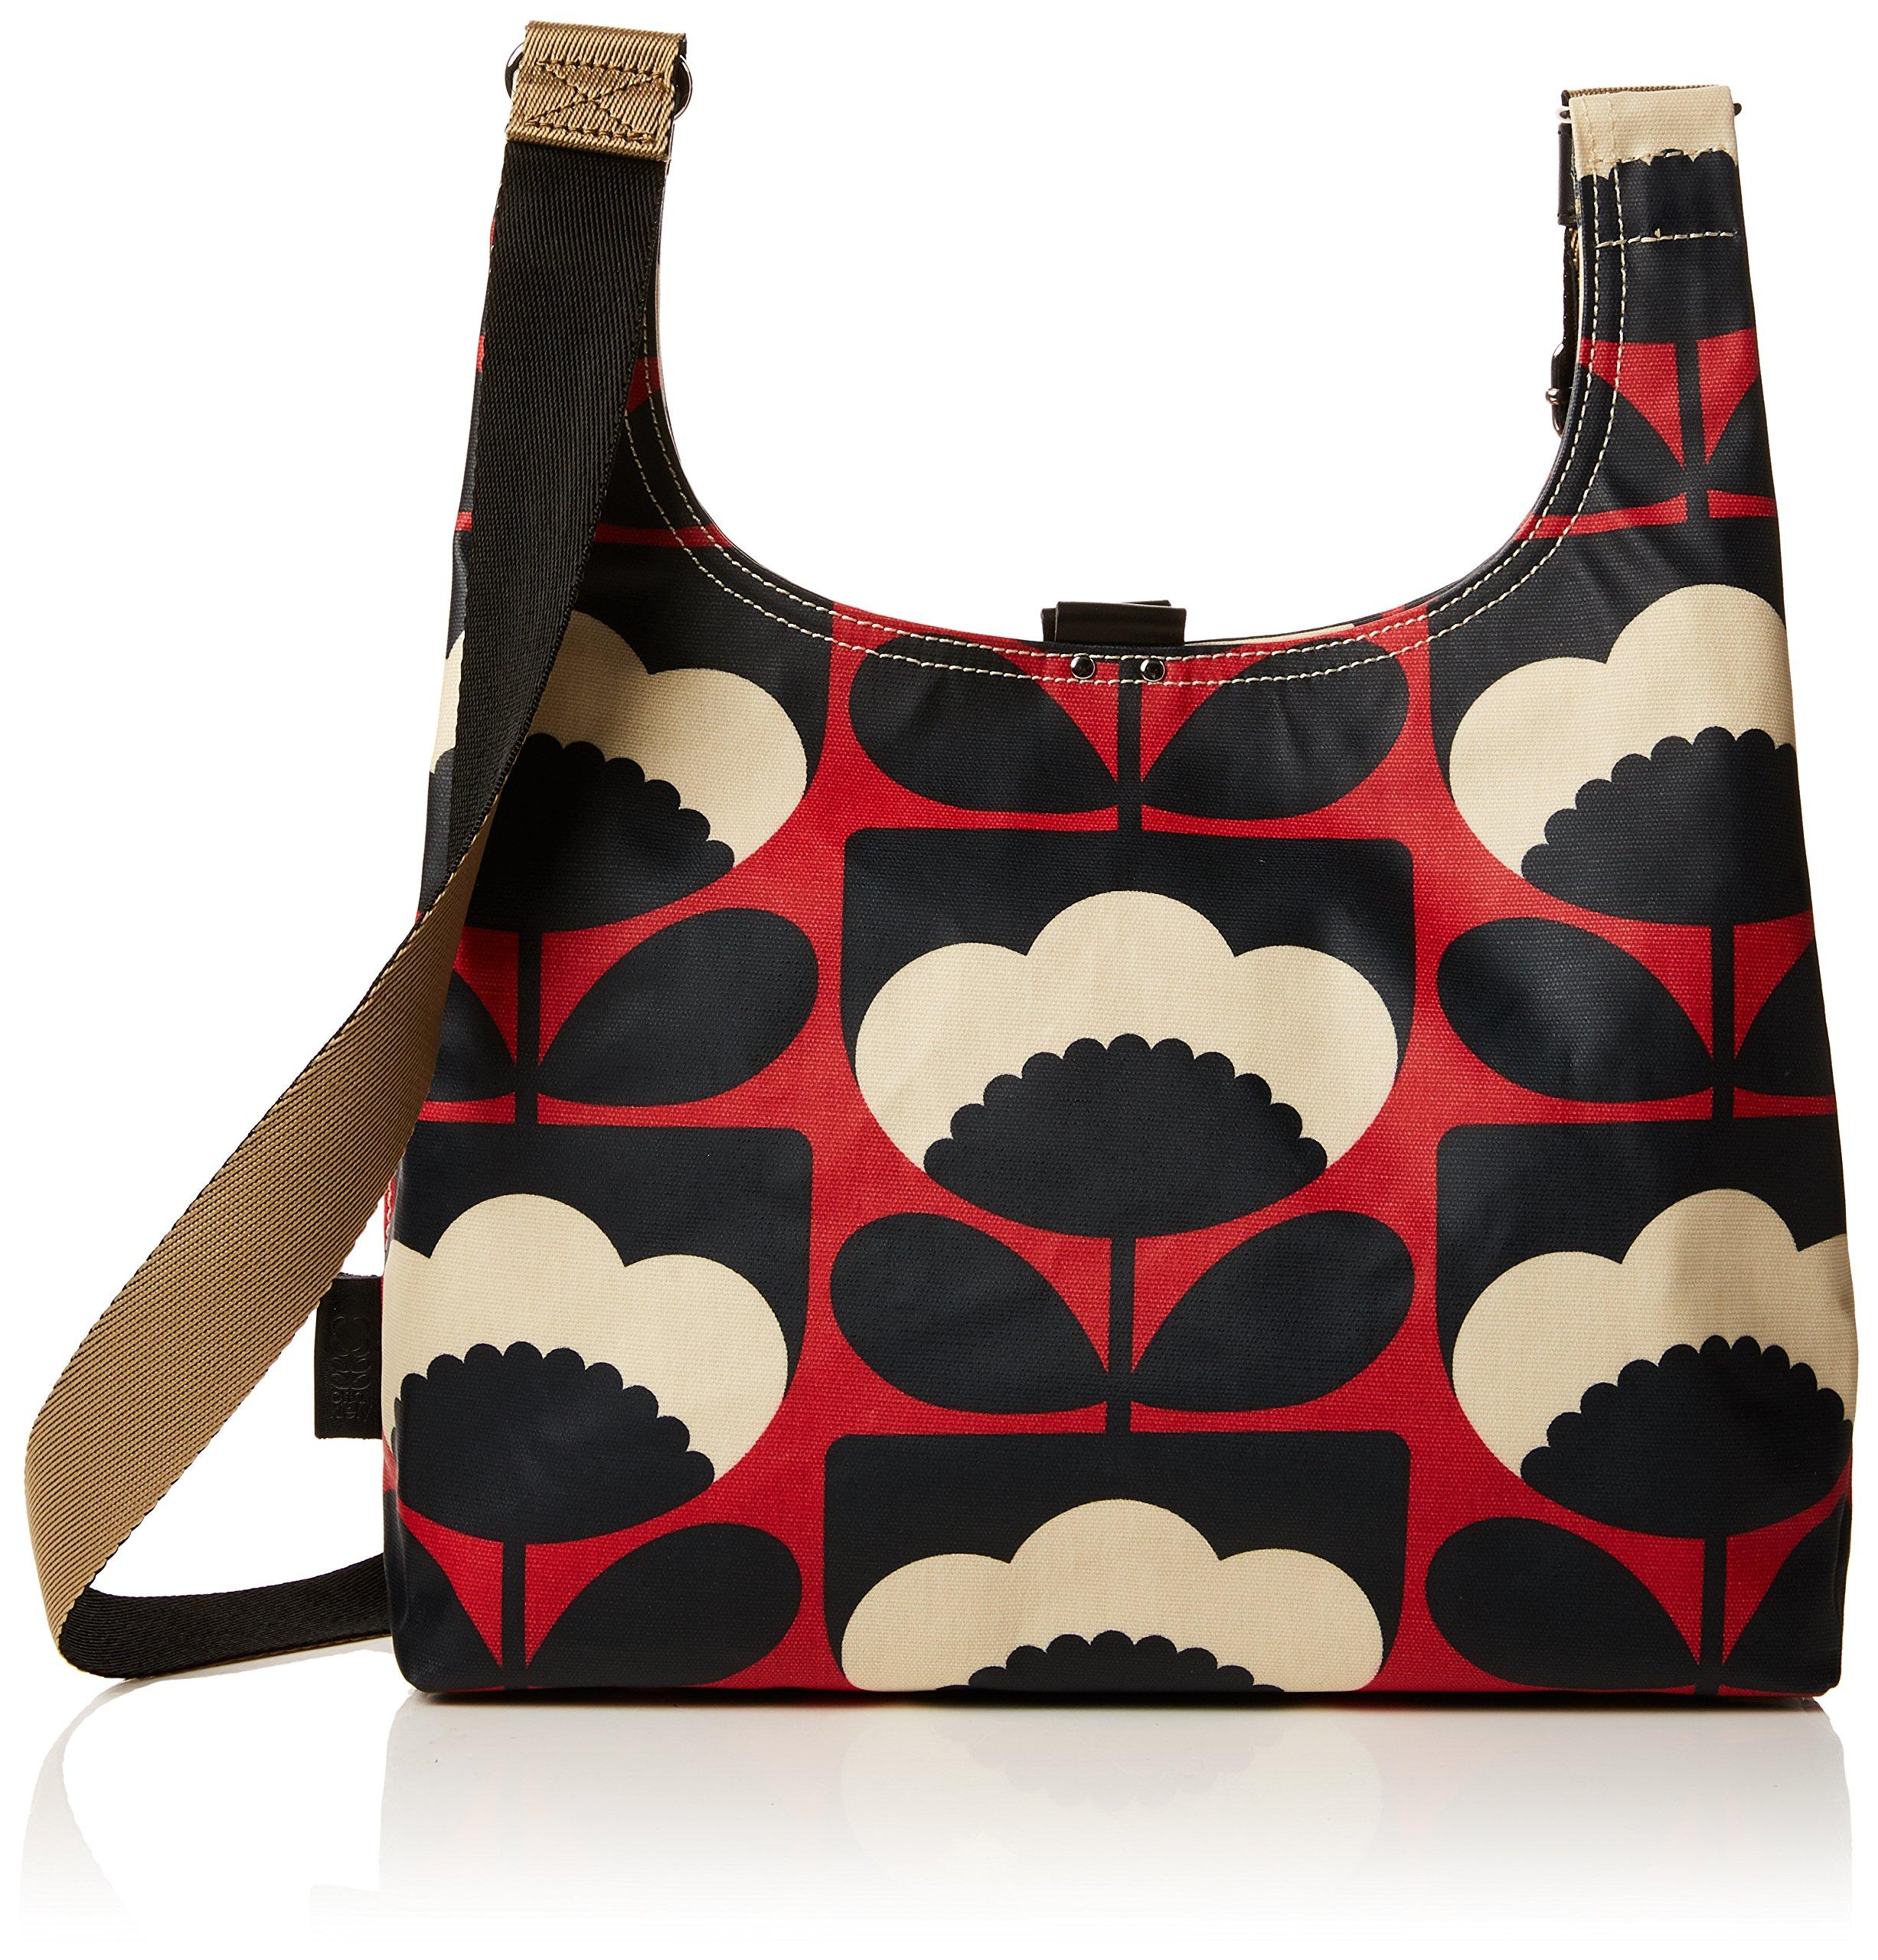 Orla Kiely Spring Bloom Midi Sling Bag, Poppy